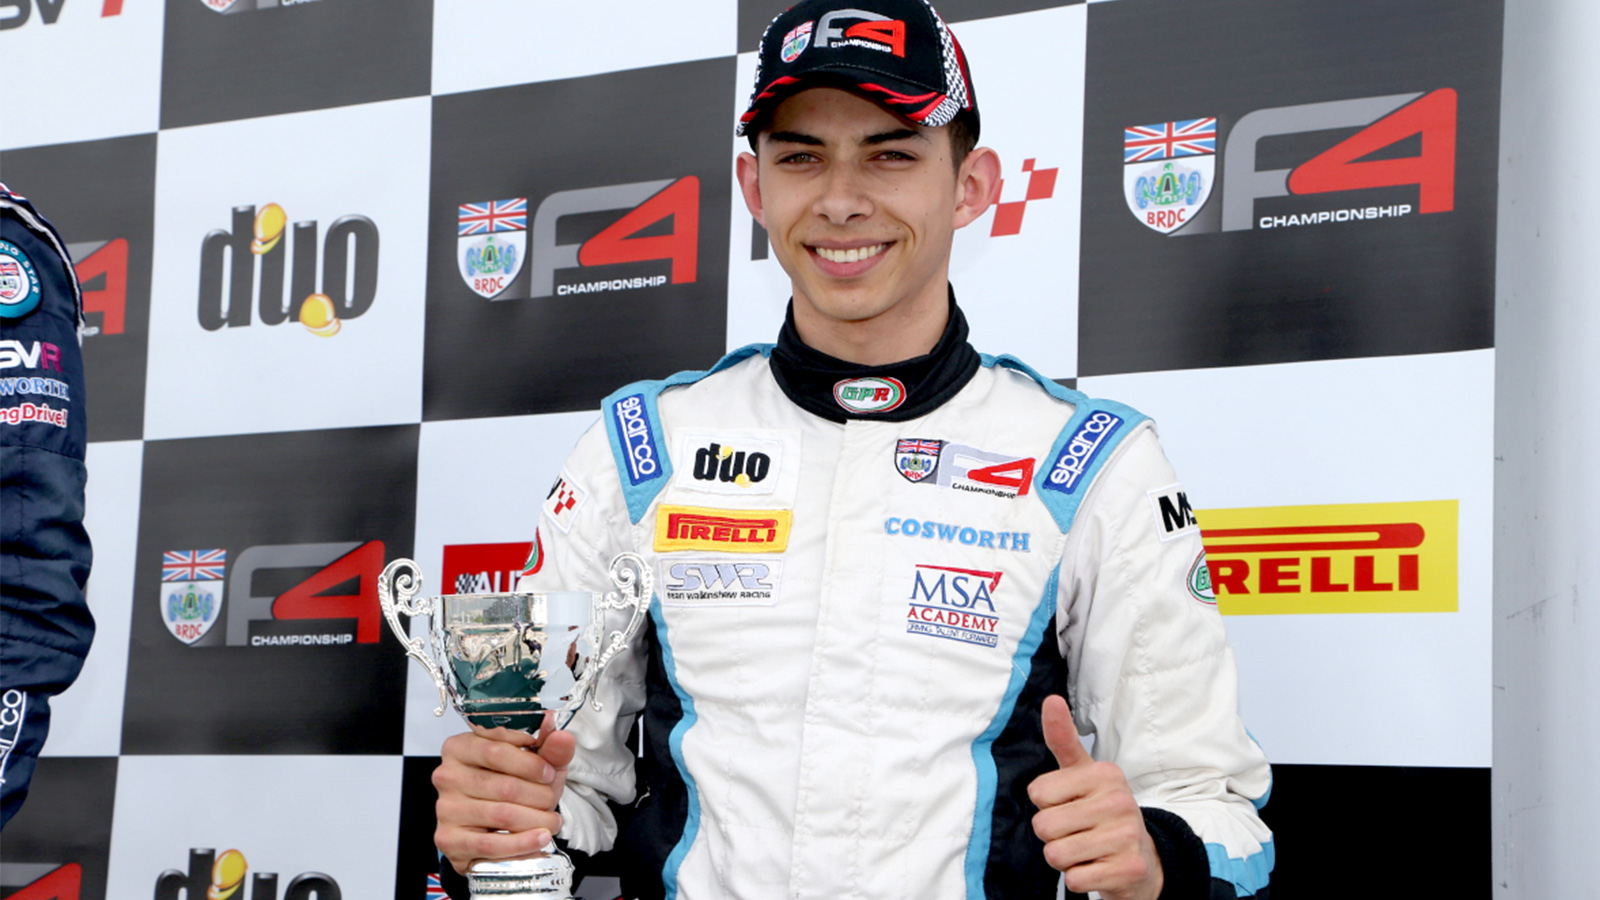 Jordan Albert's third podium of 2015.